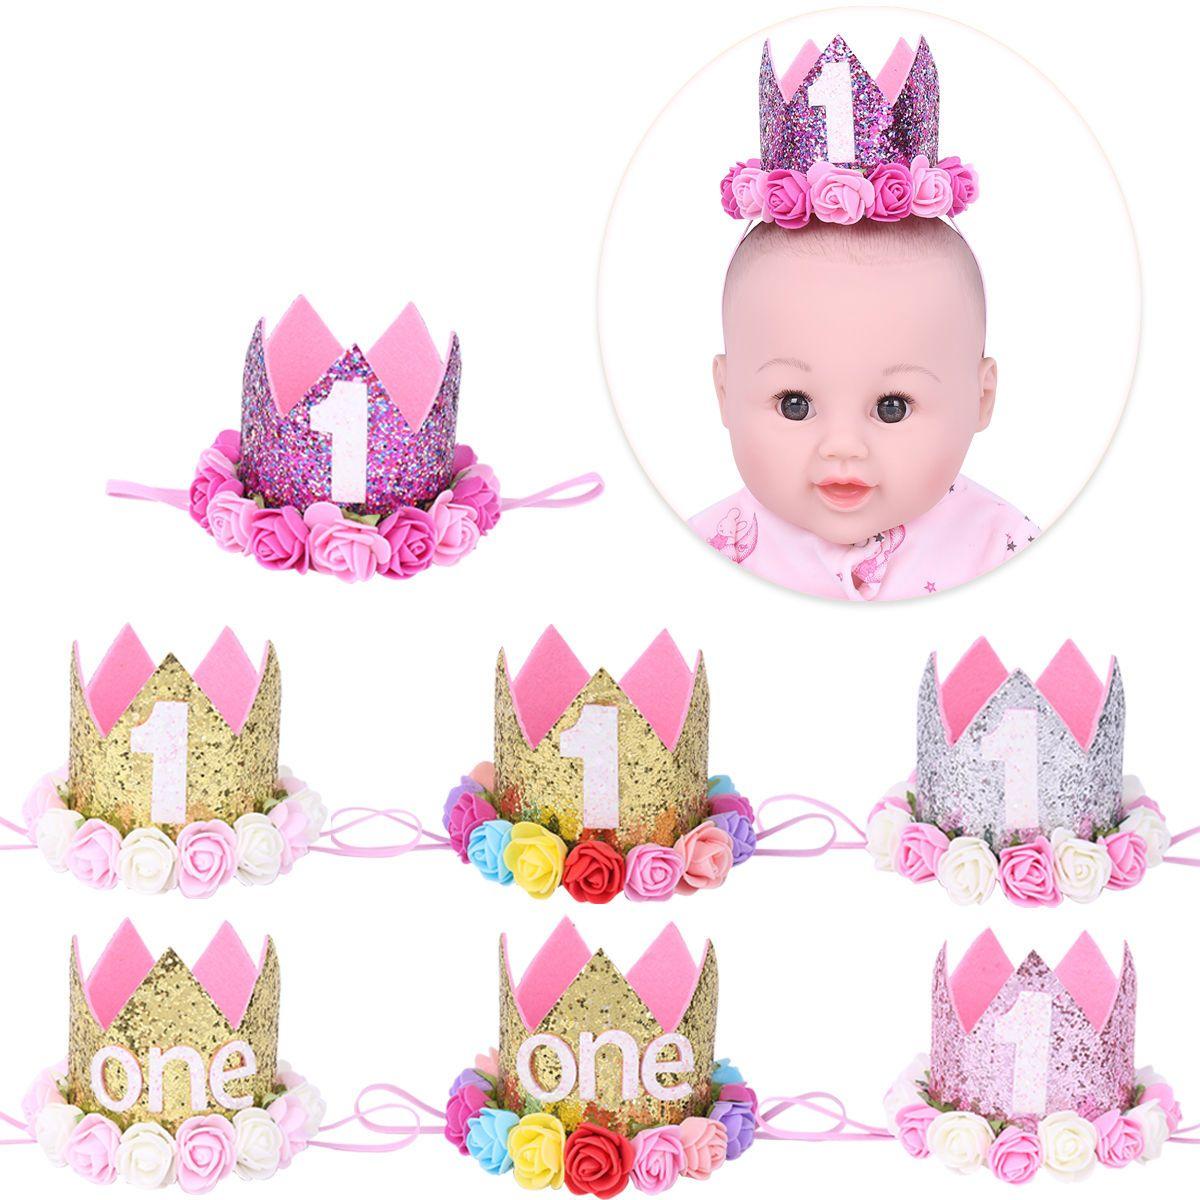 b5657e706ba  3.55 - Baby Girl 1St Birthday Sparkly Party Crown Princess Rose Flowers  Tiara Headband  ebay  Fashion